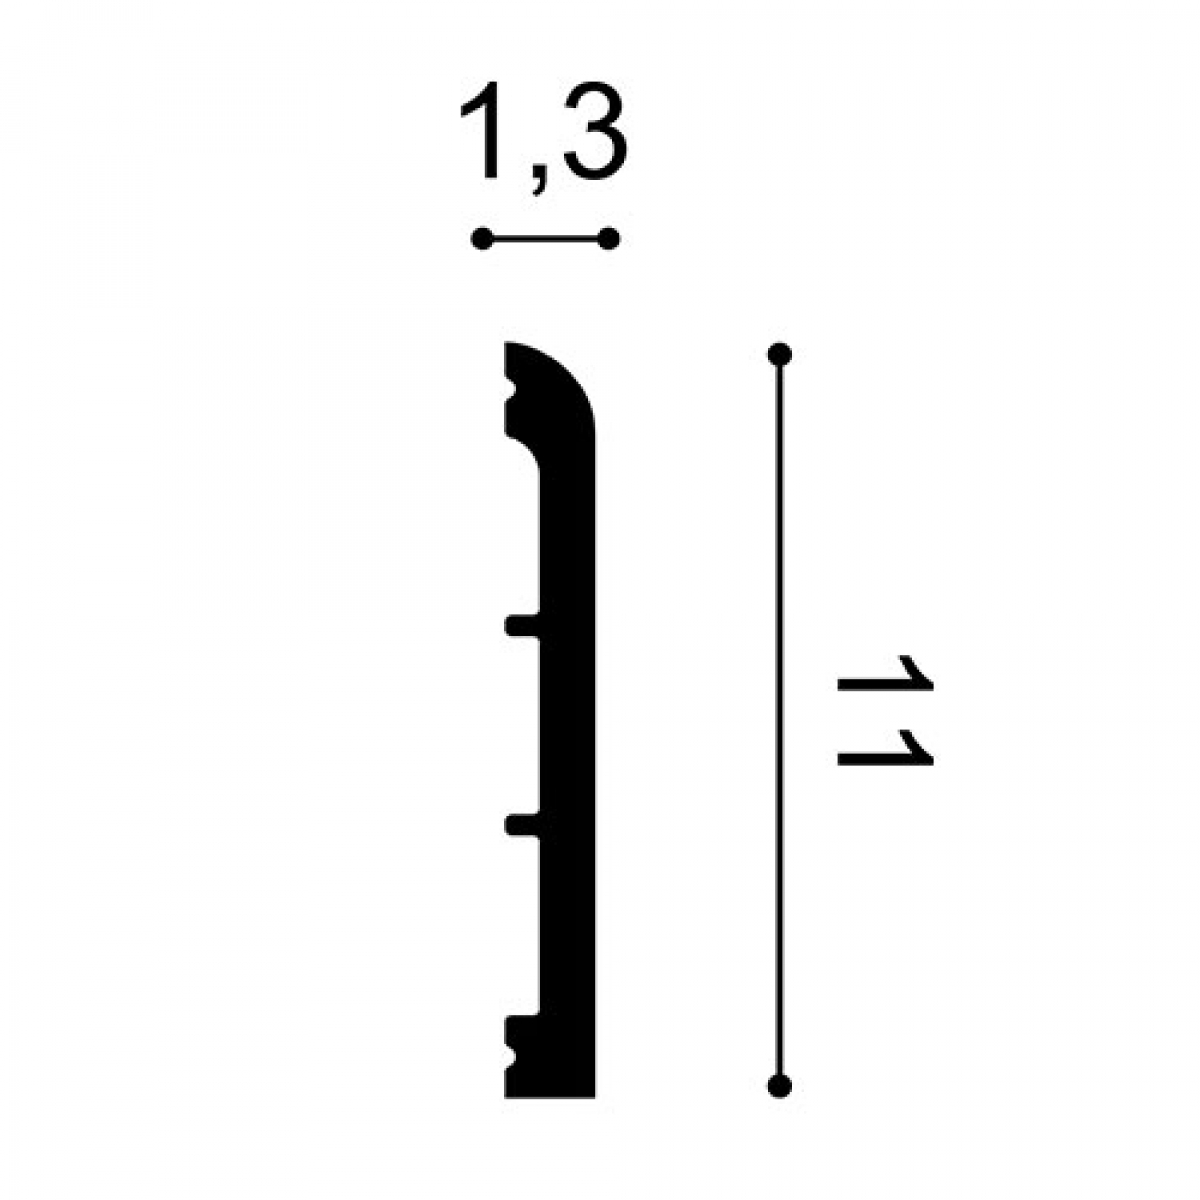 Ancadrament Usa Axxent DX184-2300, Dimensiuni: 230 X 11 X 1.3 cm, Orac Decor